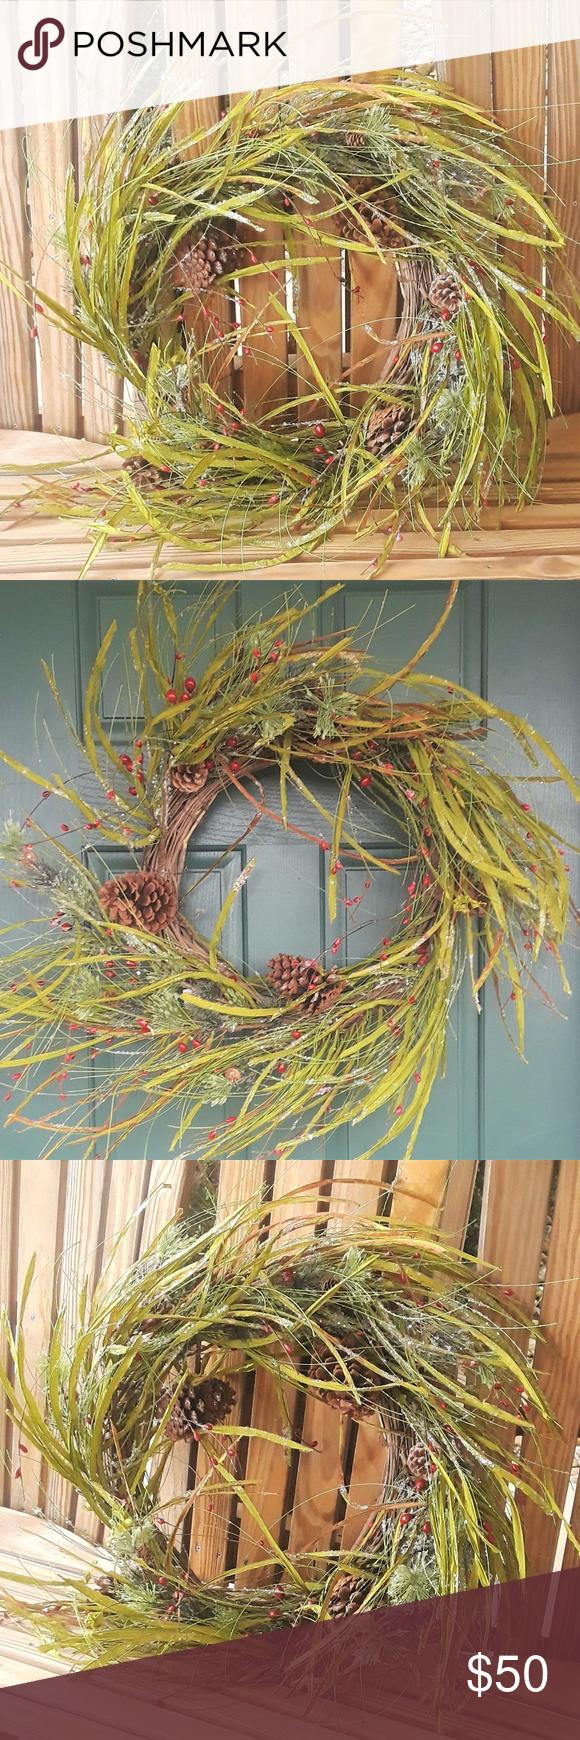 Christmas Wreath w Pinecones Berries Winter Grass Christmas  winter wreath madberries